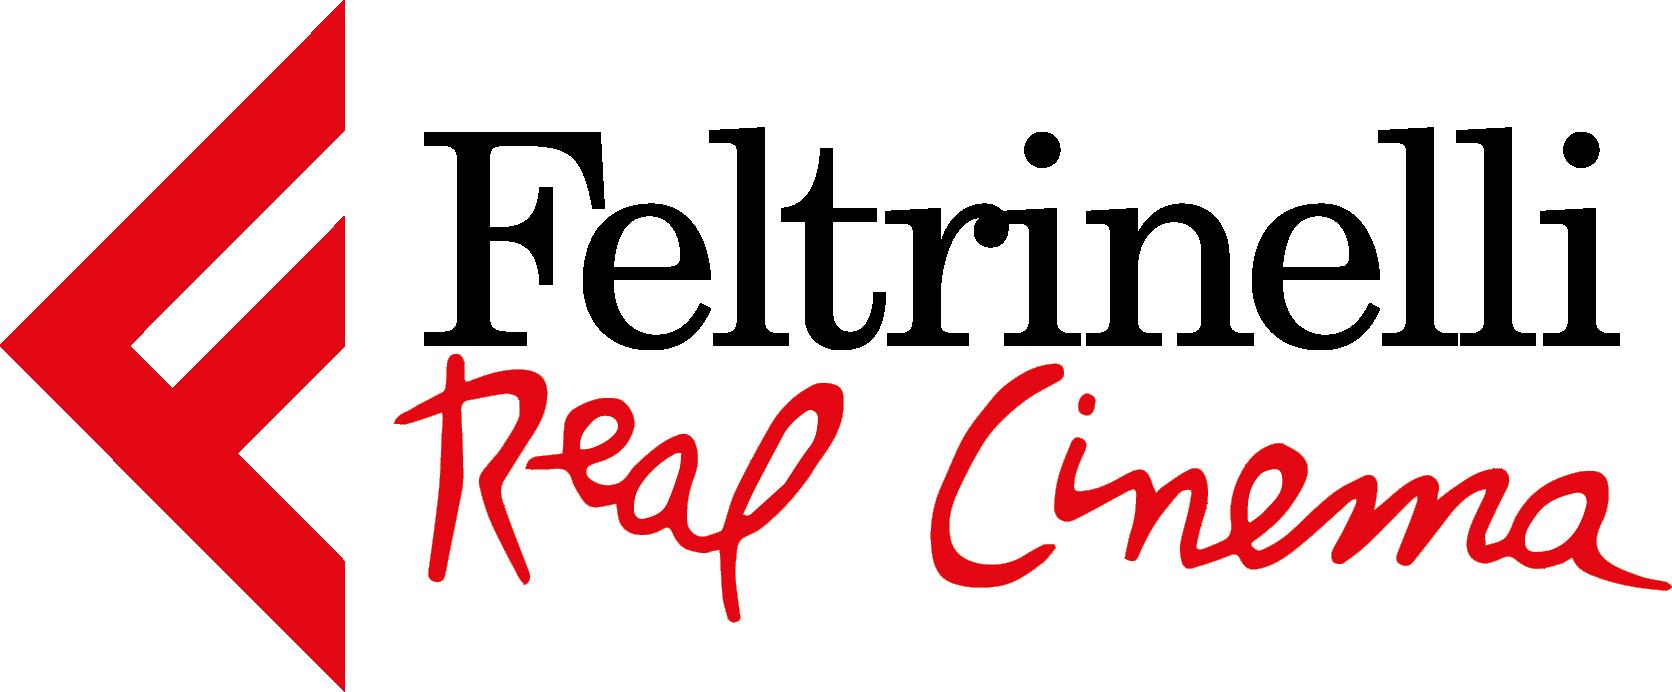 F Feltrinelli Real Cinema.png